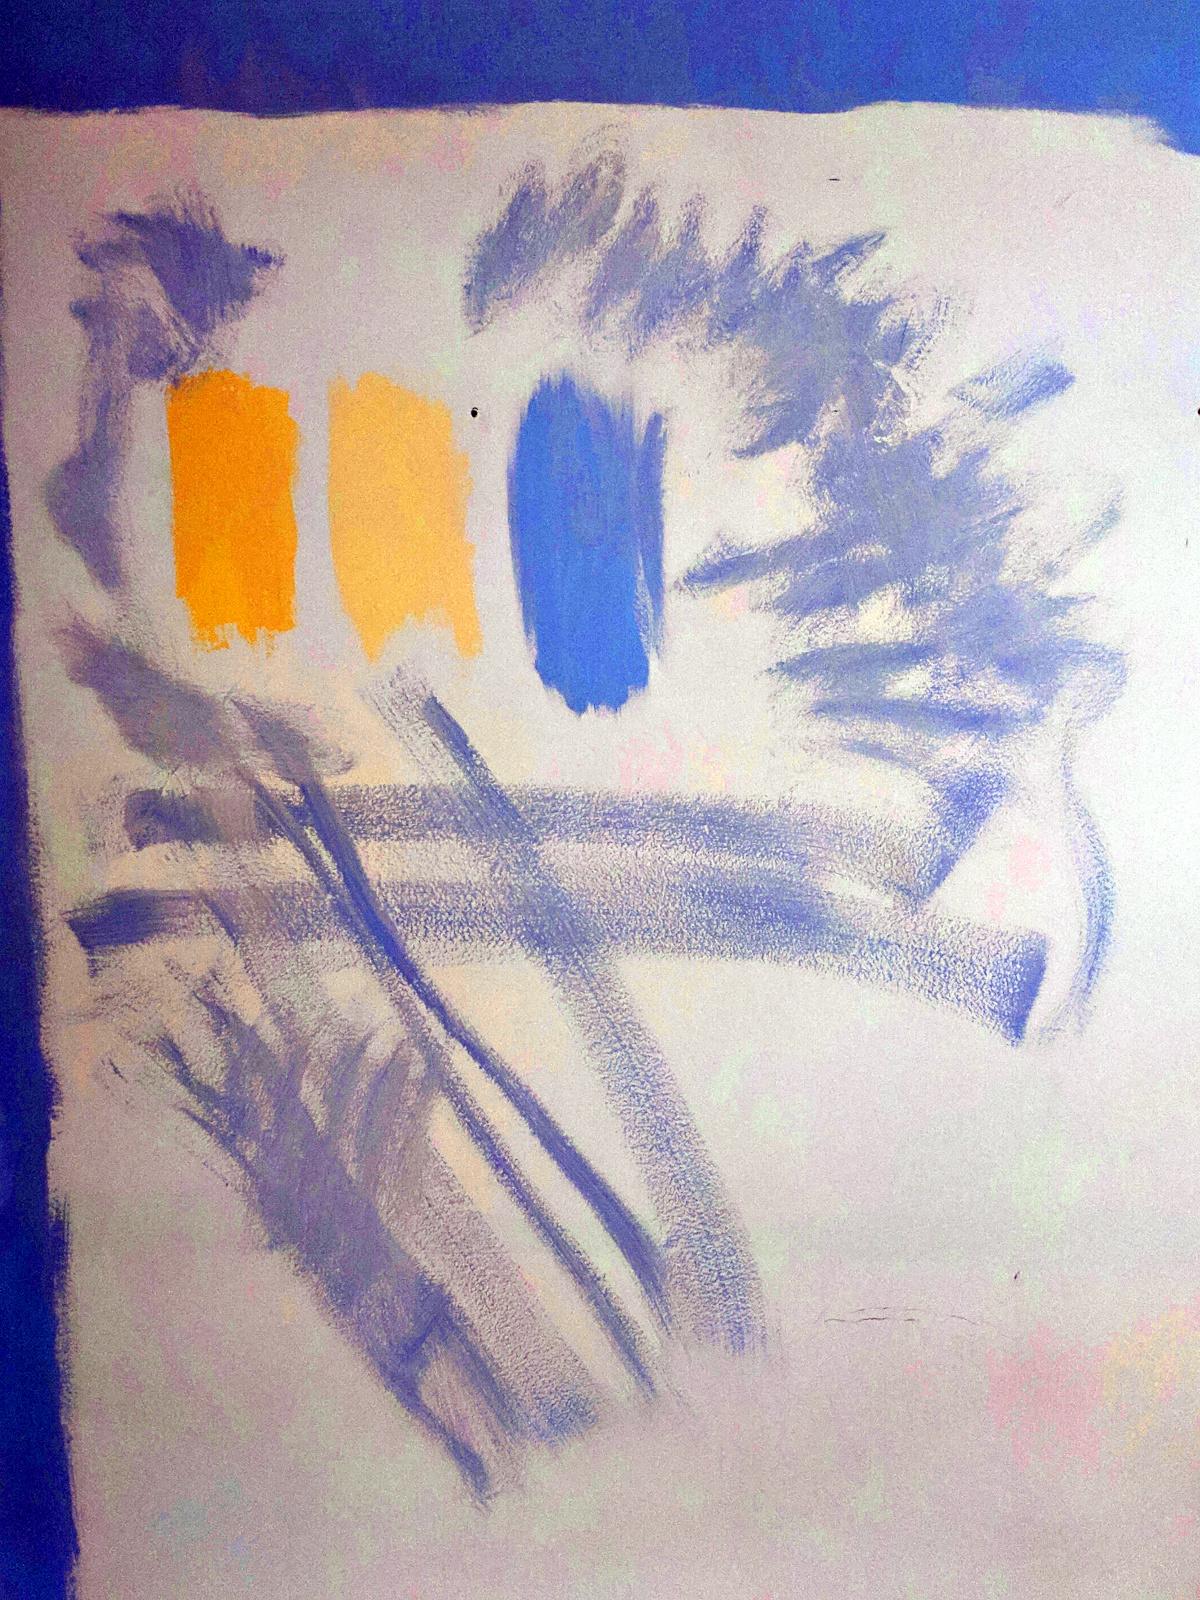 AbstractExpressionism-NancysStudy2a-huelevl.jpg